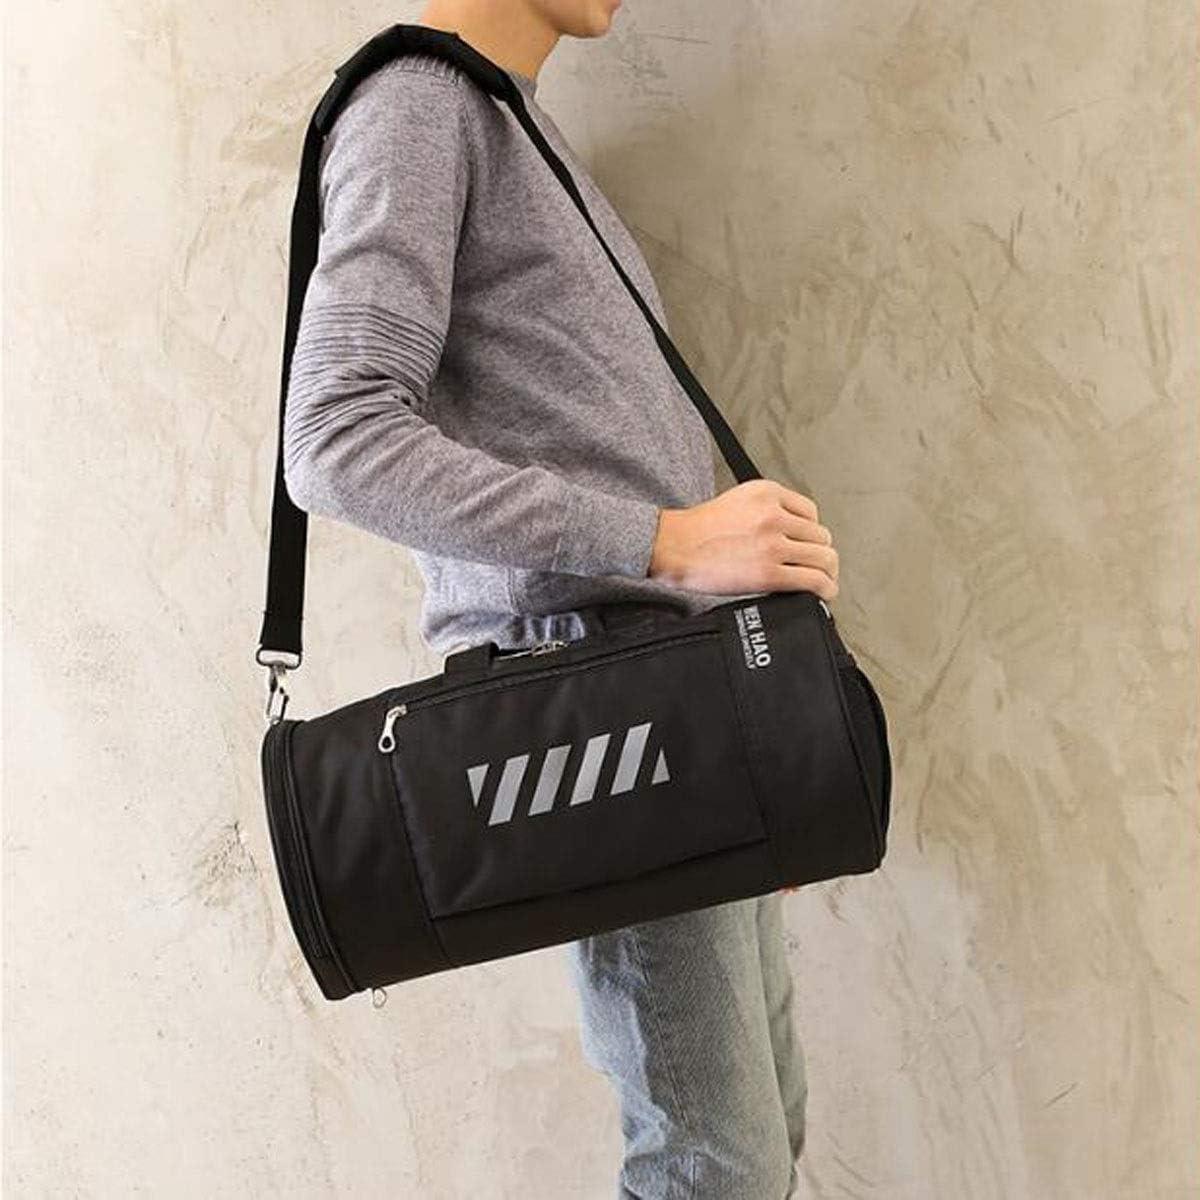 Large Size: 482626cm Travel Du Large-Capacity Fitness Bag Korean Cylinder Bag Fitness Short-Distance Travel Bag Etc ZHICHUANG Duffel Bag Travel Portable Yoga Bag Suitable for Business Trip